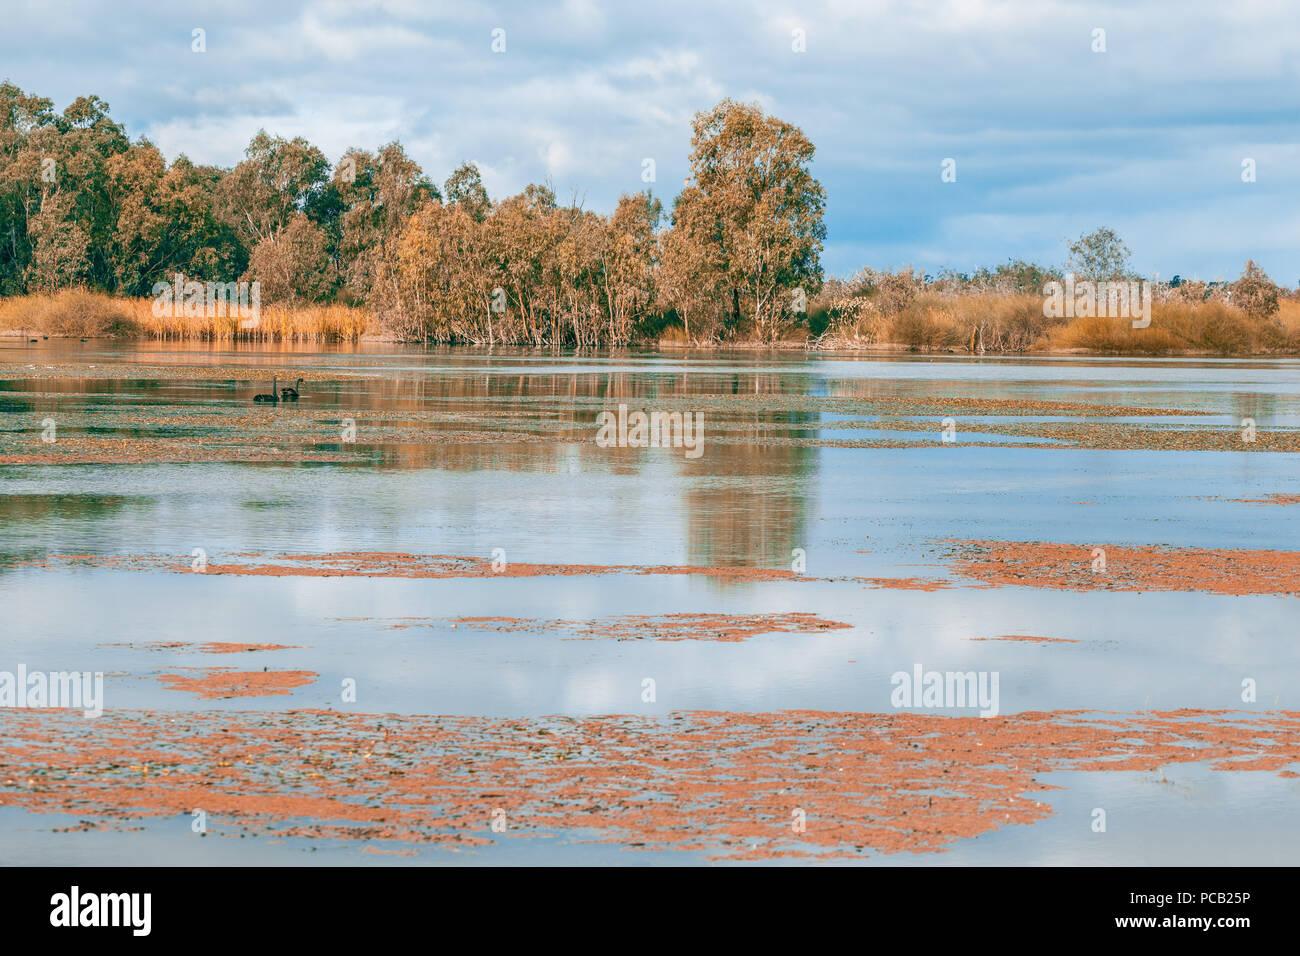 Hermosa reserva natural sobre el río Murray en Banrock Station, Riverland, South Australia Imagen De Stock